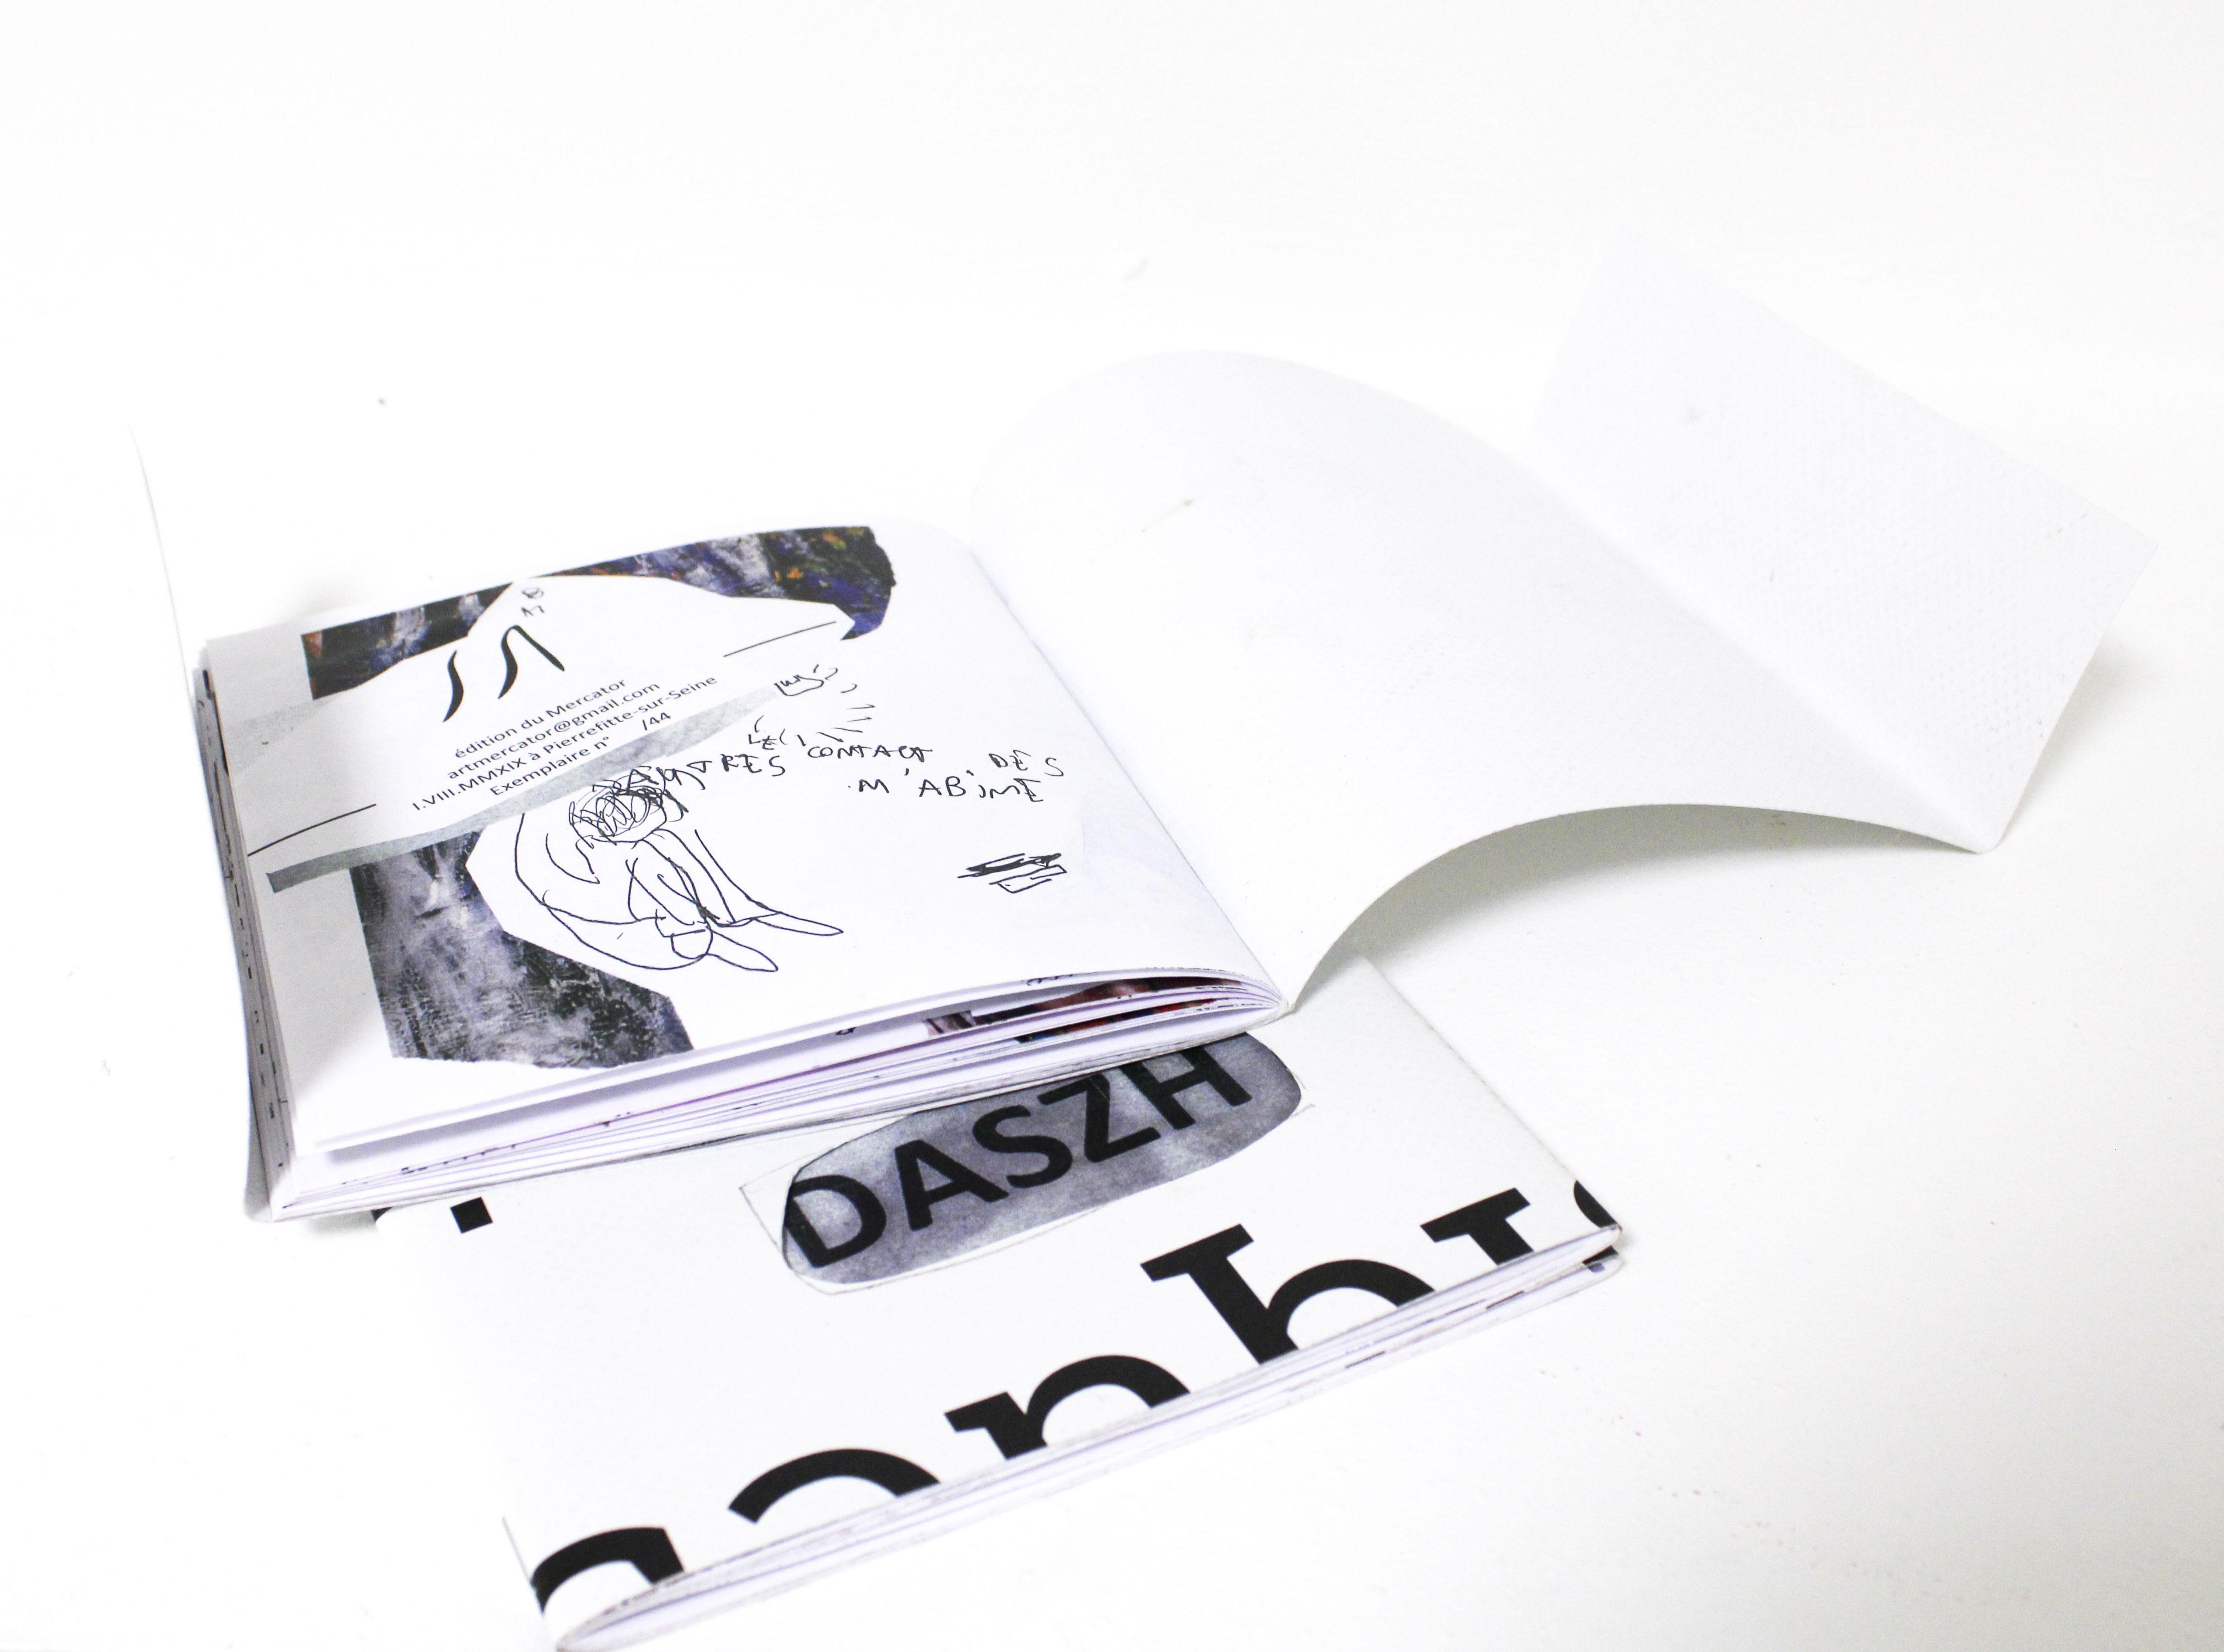 EDITION-MERCATOR-DASZH-2